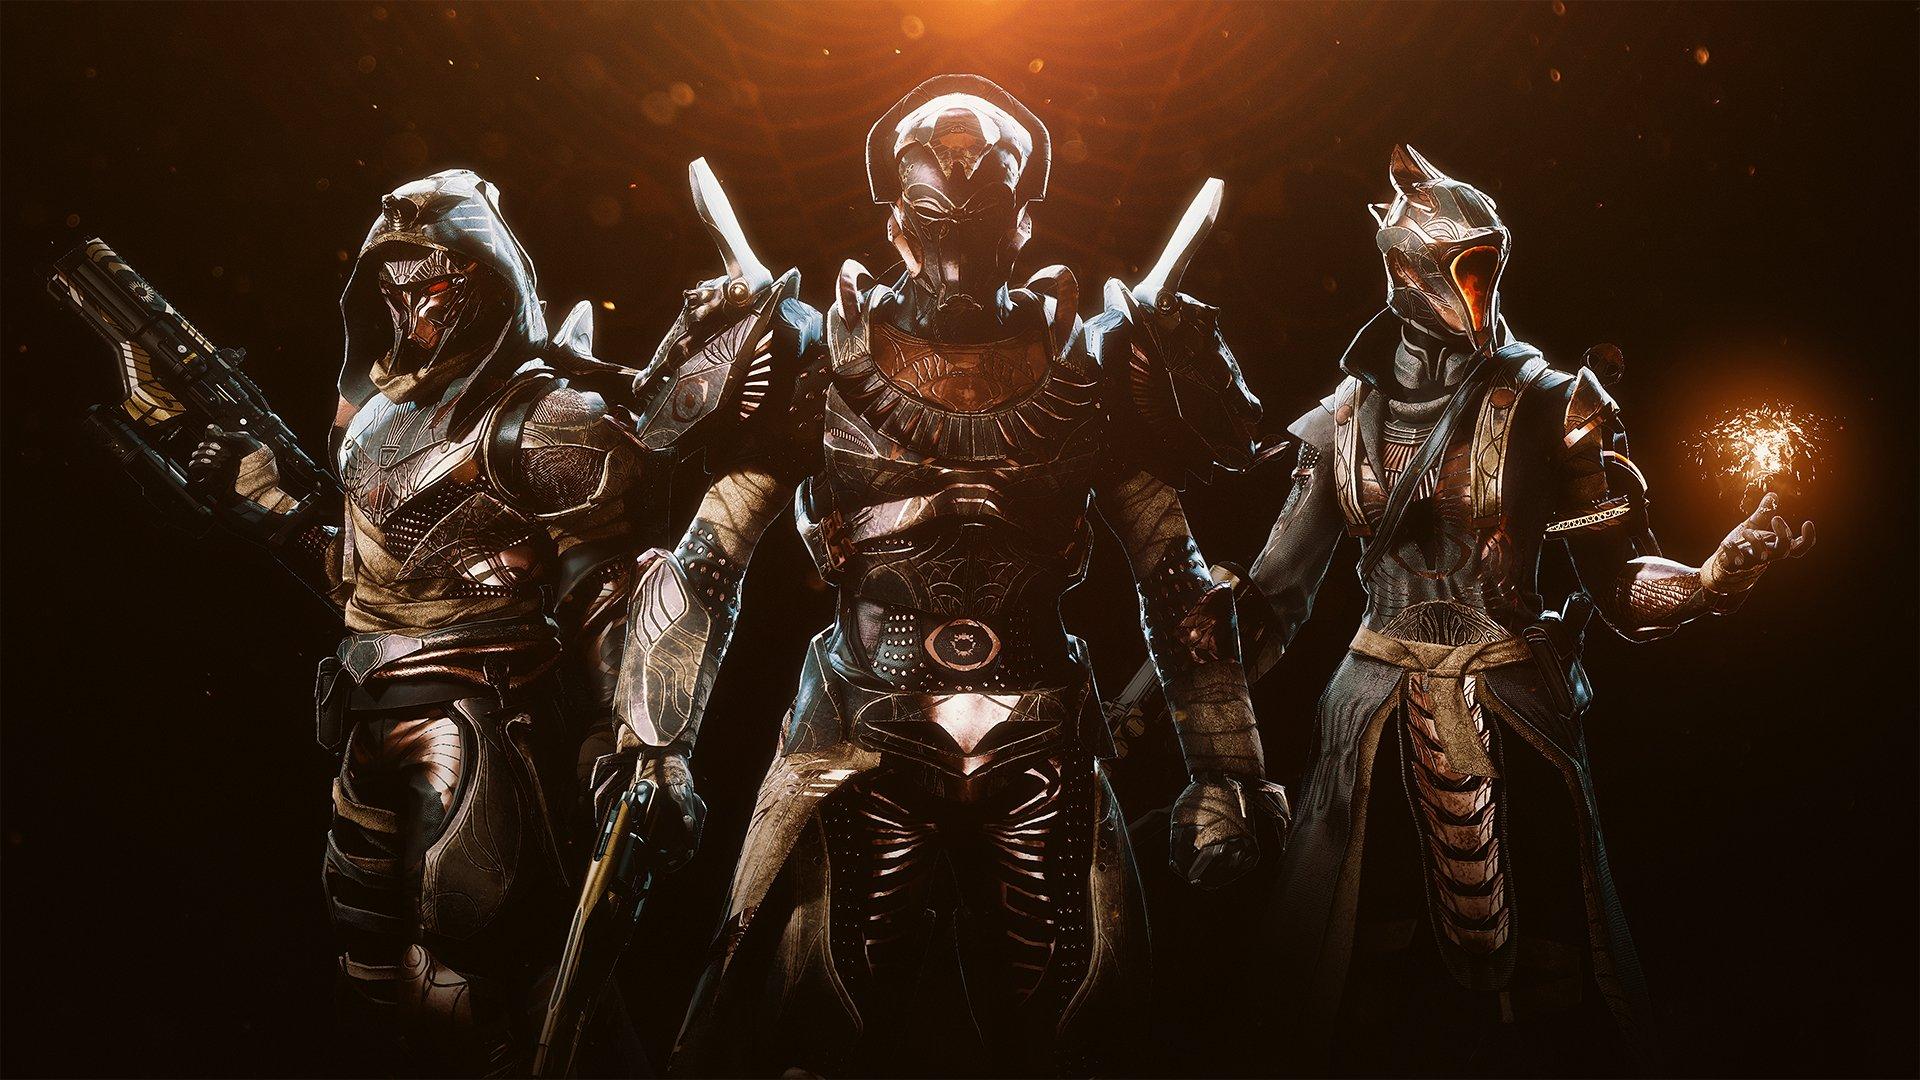 Trials_S13_Armor_JB_Group